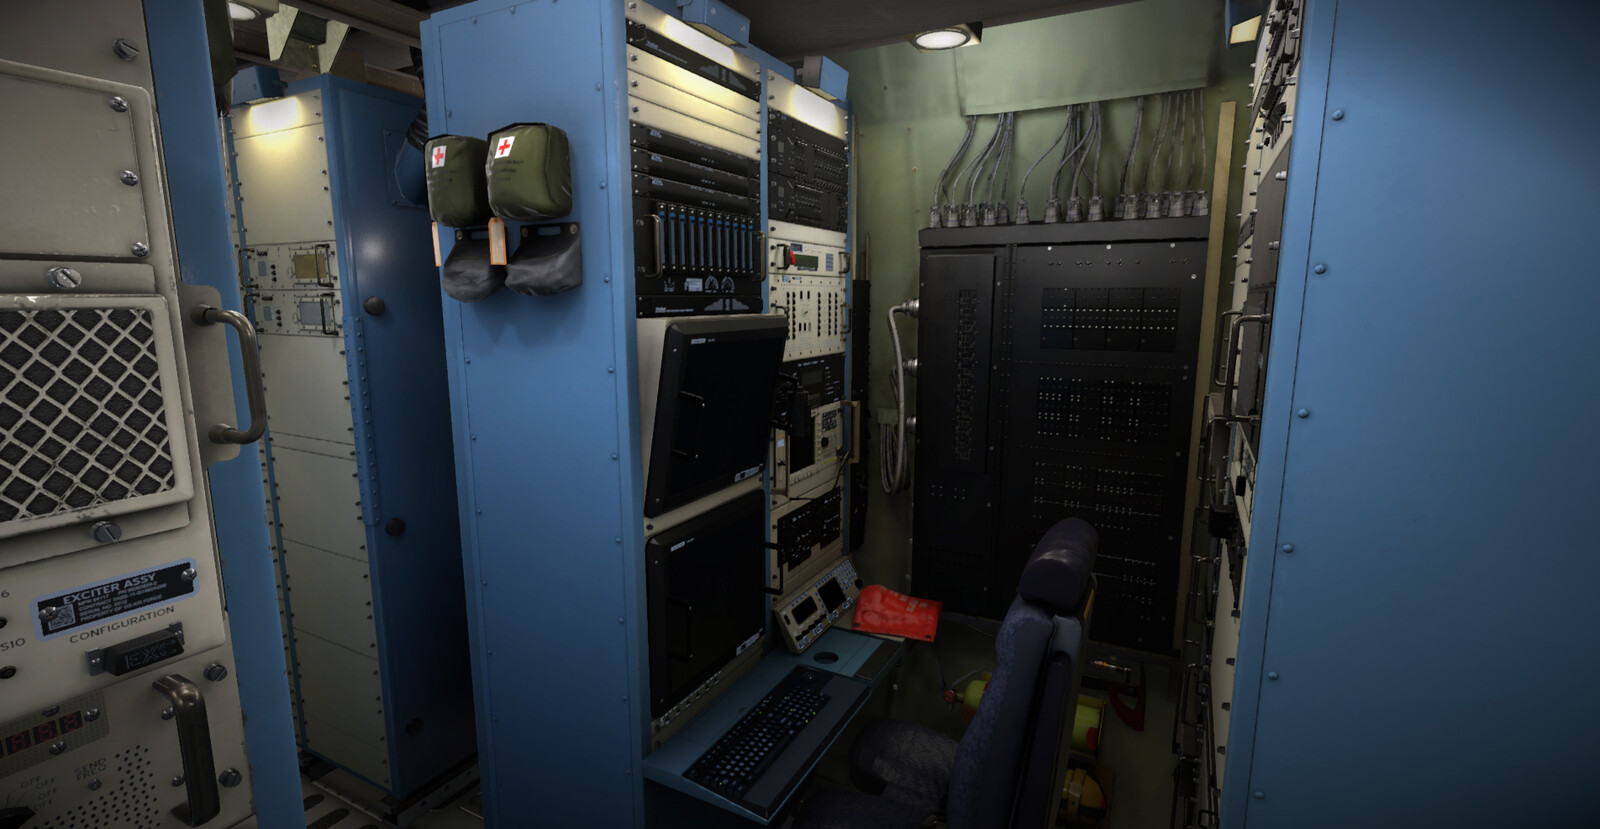 EC-130